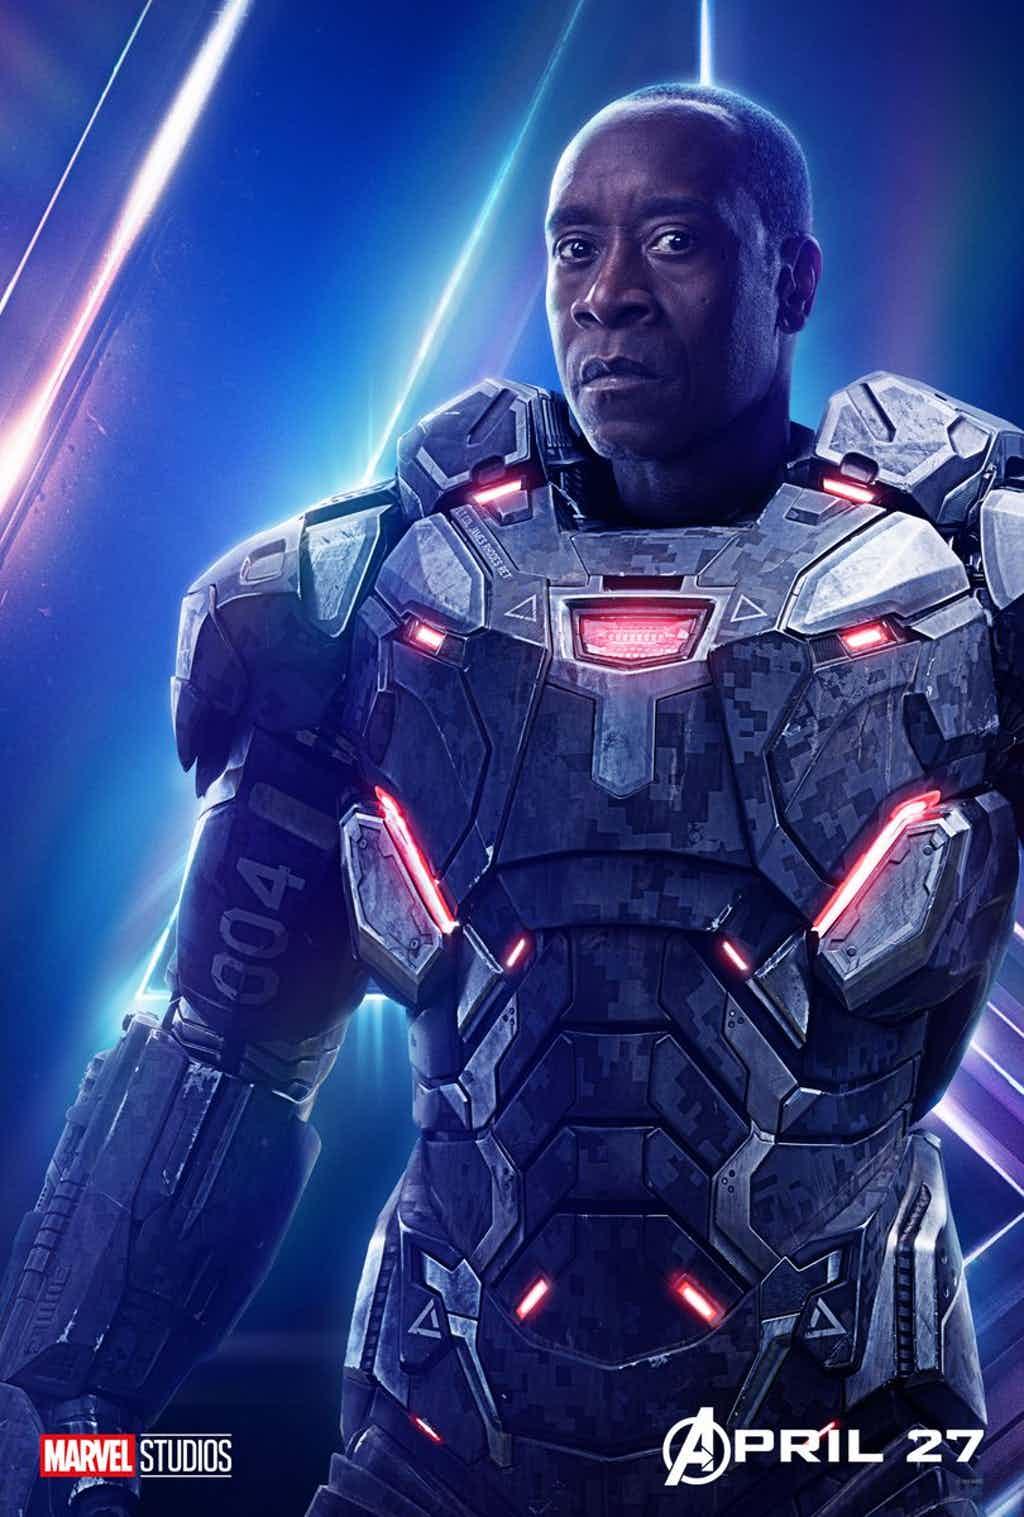 szmk_marvel_infinity_war_vegtelen_haboru_bosszuallok_avengers_ironman_hulk_thor_captainamaerica_guardians_galaxy_19.jpg